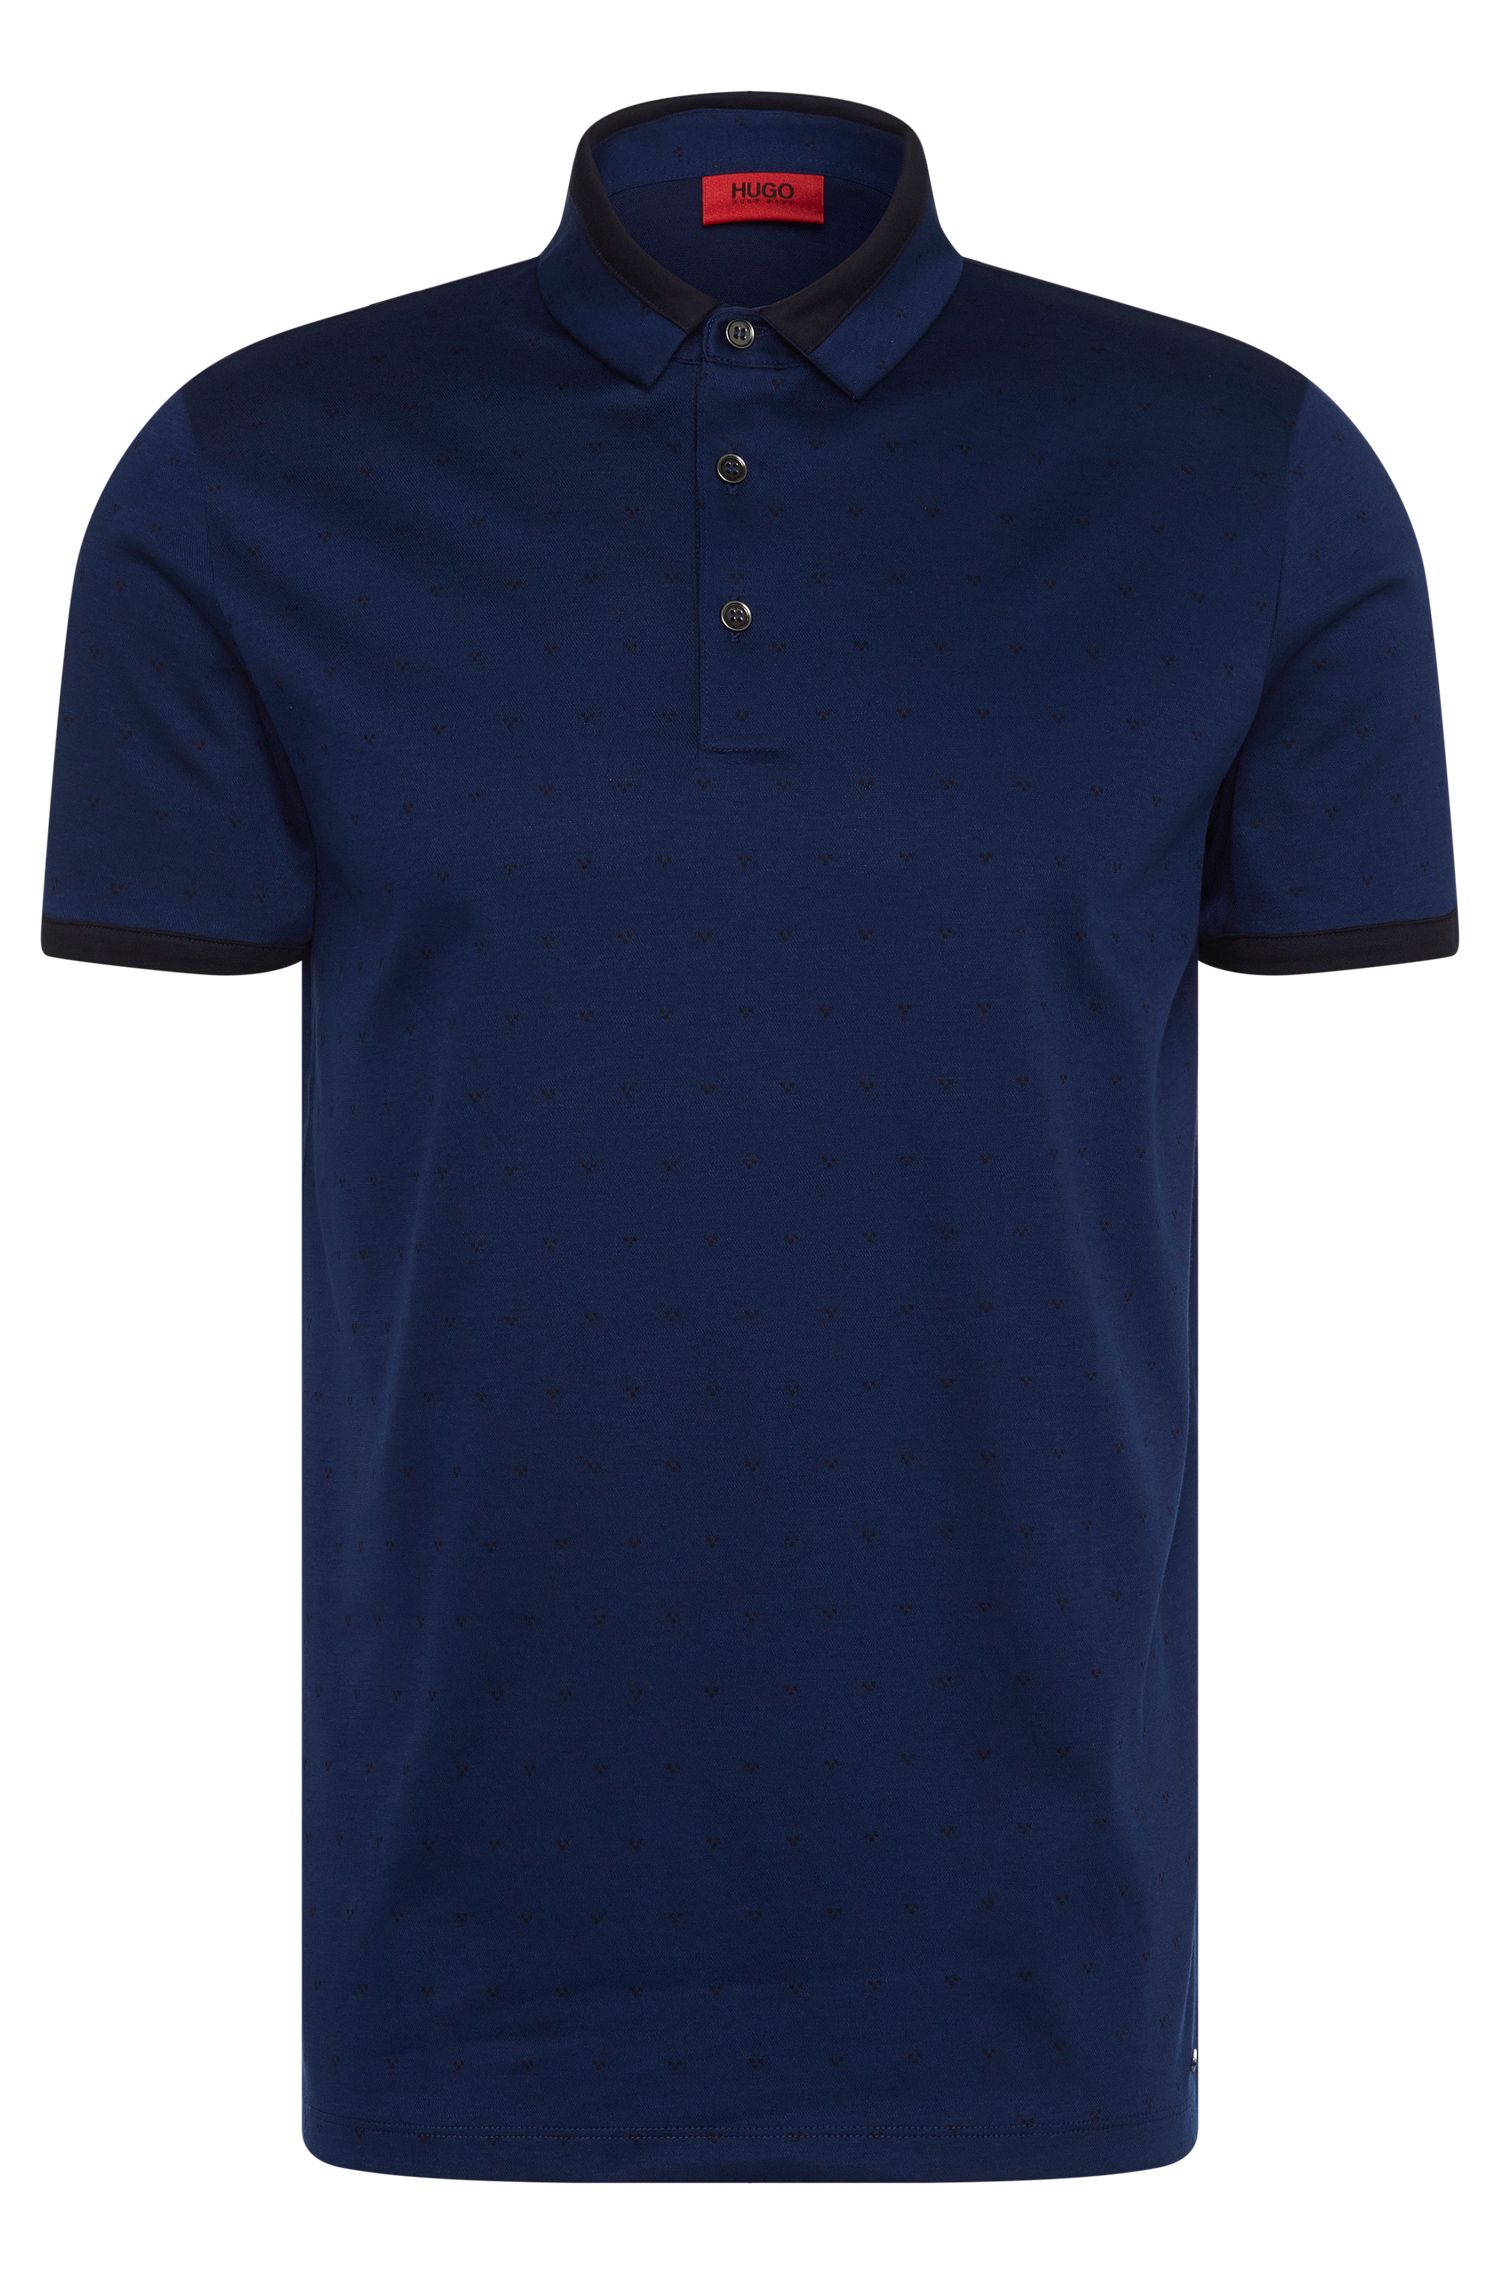 Mottled slim-fit polo shirt in mercerised cotton: 'Denno'